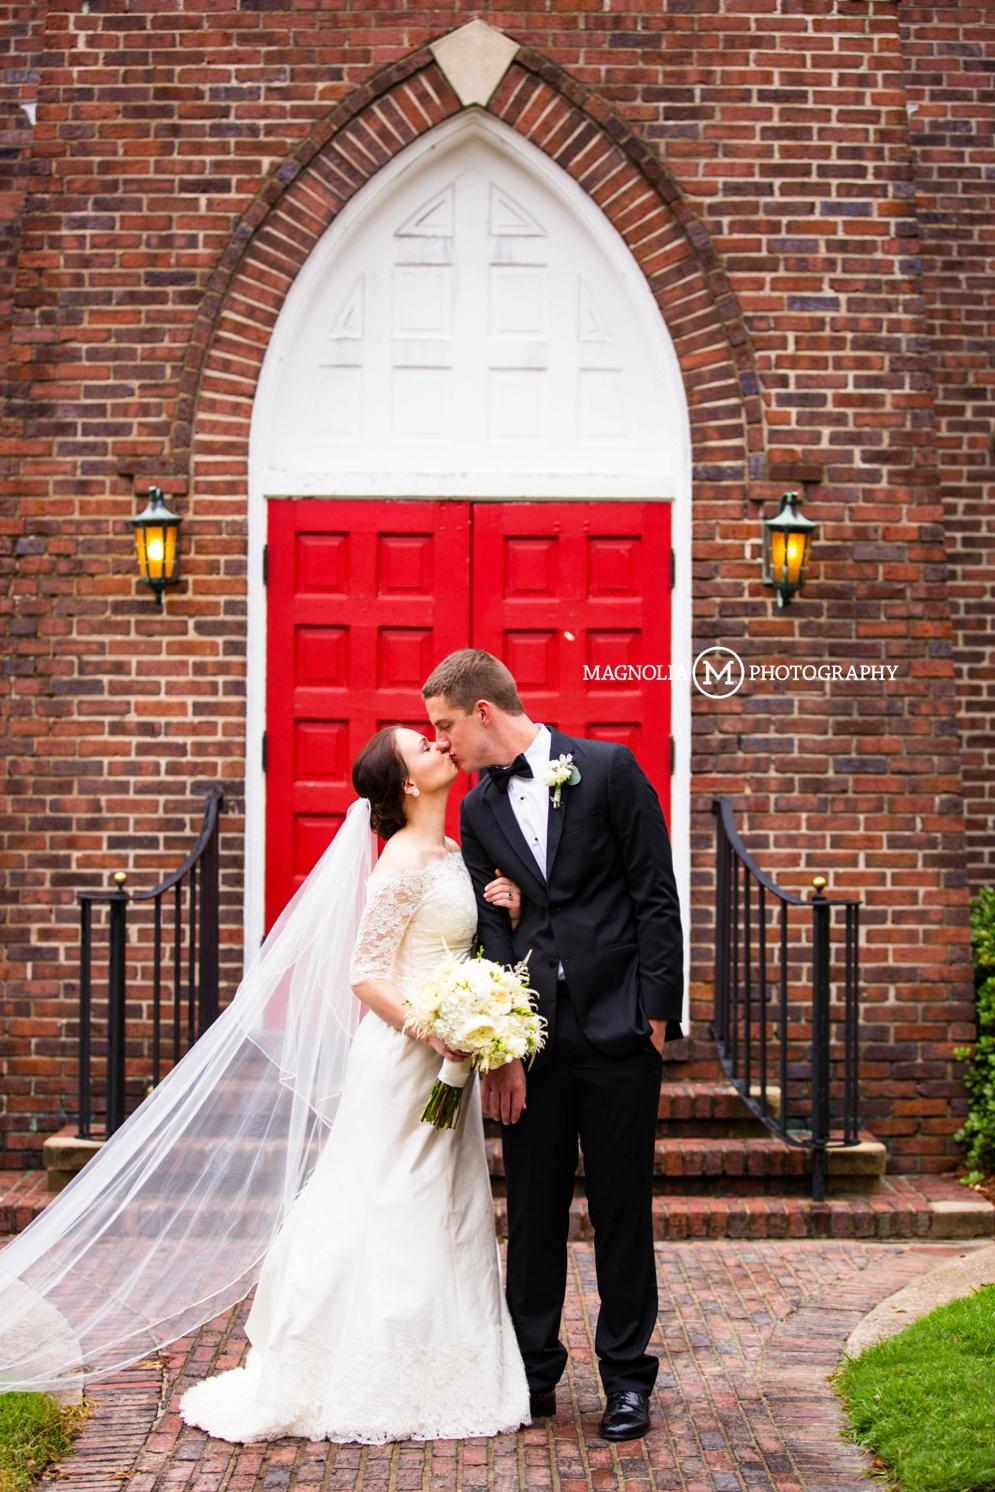 Magnolia Photography Greenville Nc Wedding Photographer Rock Springs